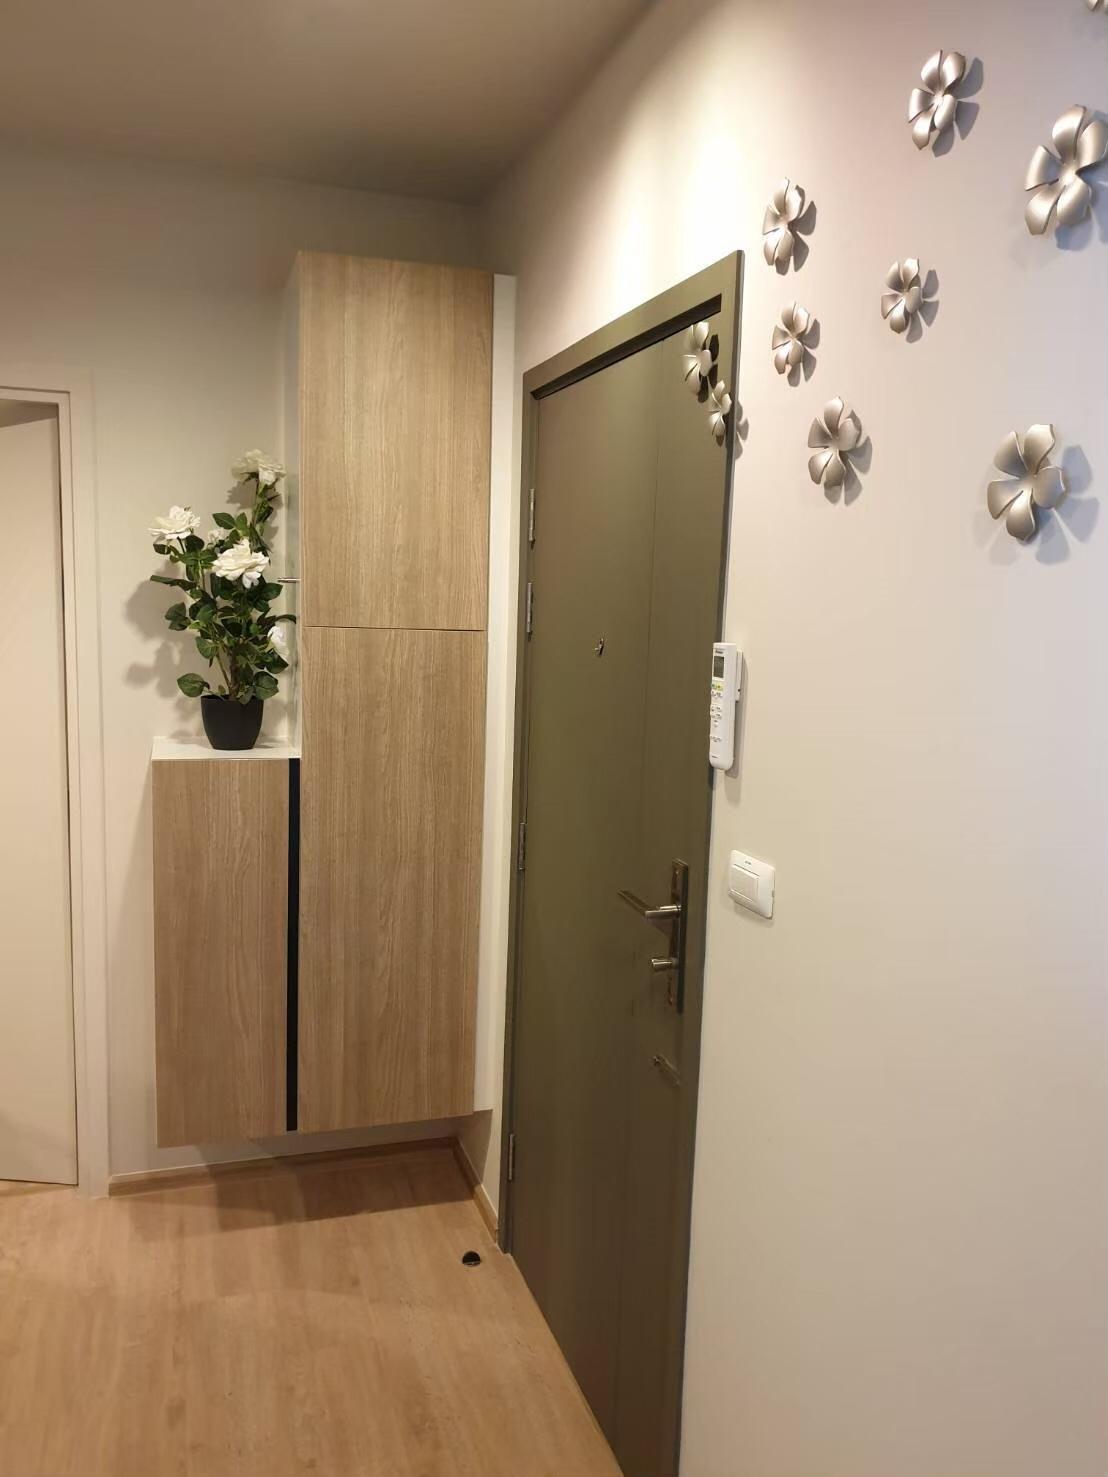 Escent Condominium (Room 89/64 floor 8) อพาร์ตเมนต์ 1 ห้องนอน 1 ห้องน้ำส่วนตัว ขนาด 36 ตร.ม. – ตัวเมืองระยอง